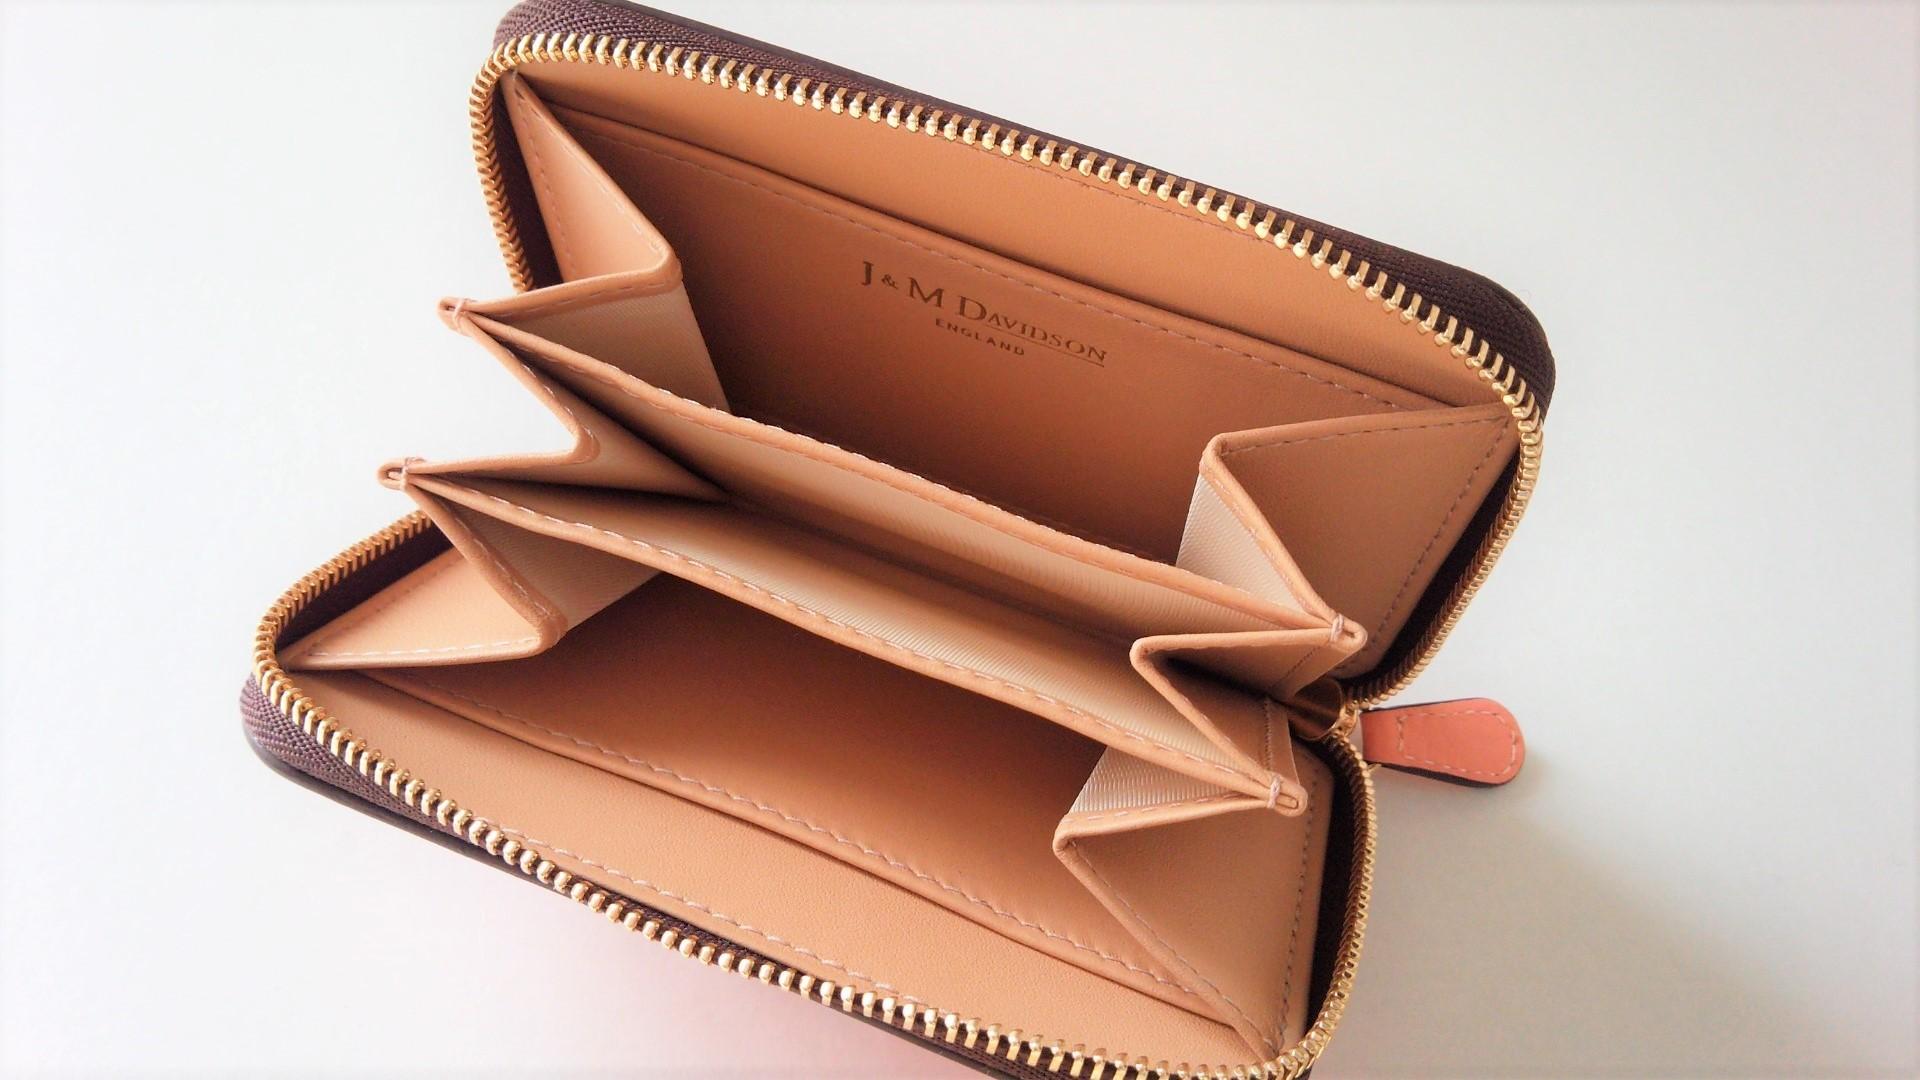 NEXT財布はミニサイズ_1_2